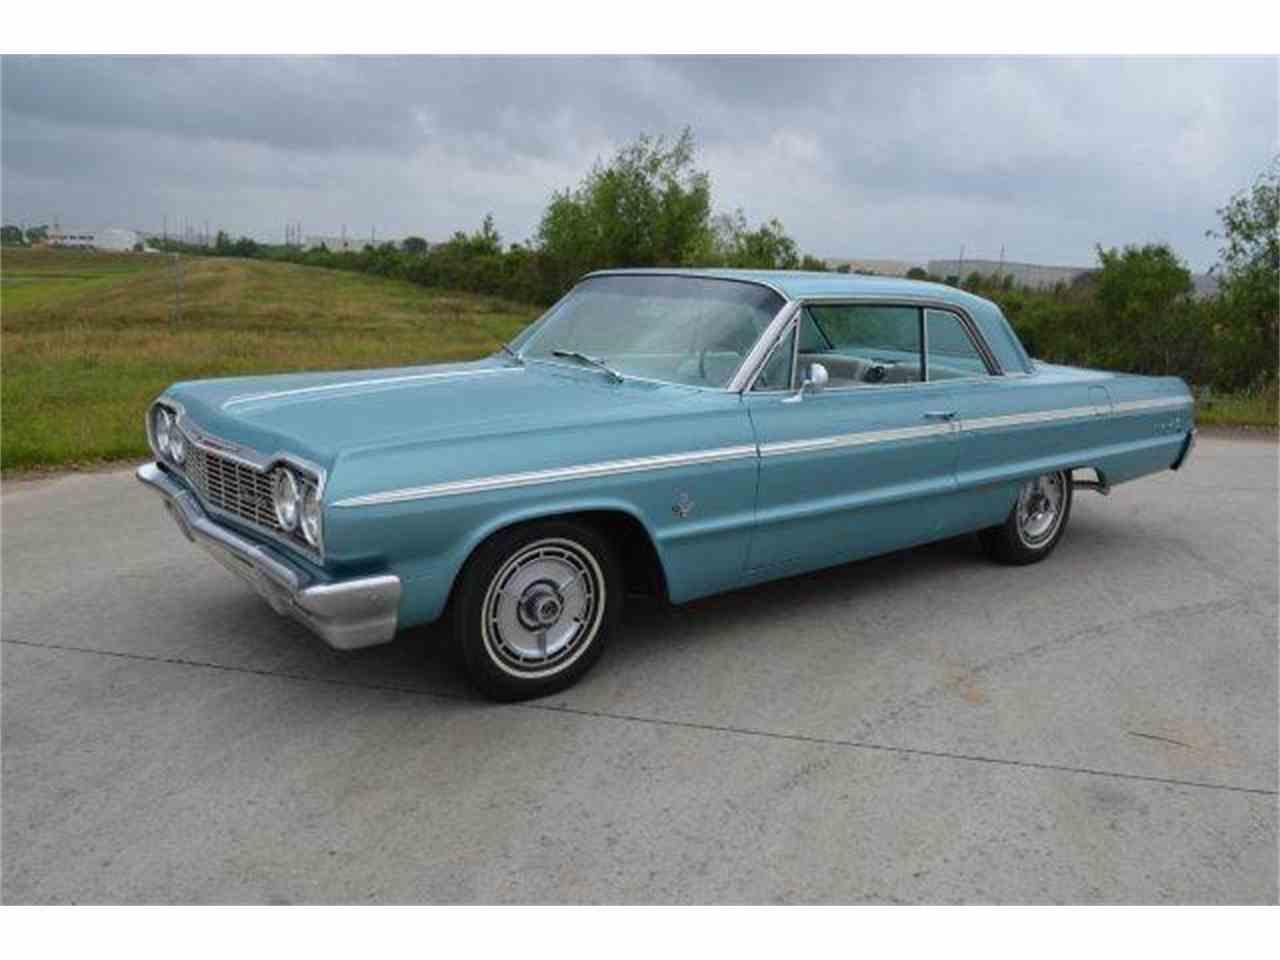 1964 chevrolet impala ss for sale cc. Black Bedroom Furniture Sets. Home Design Ideas